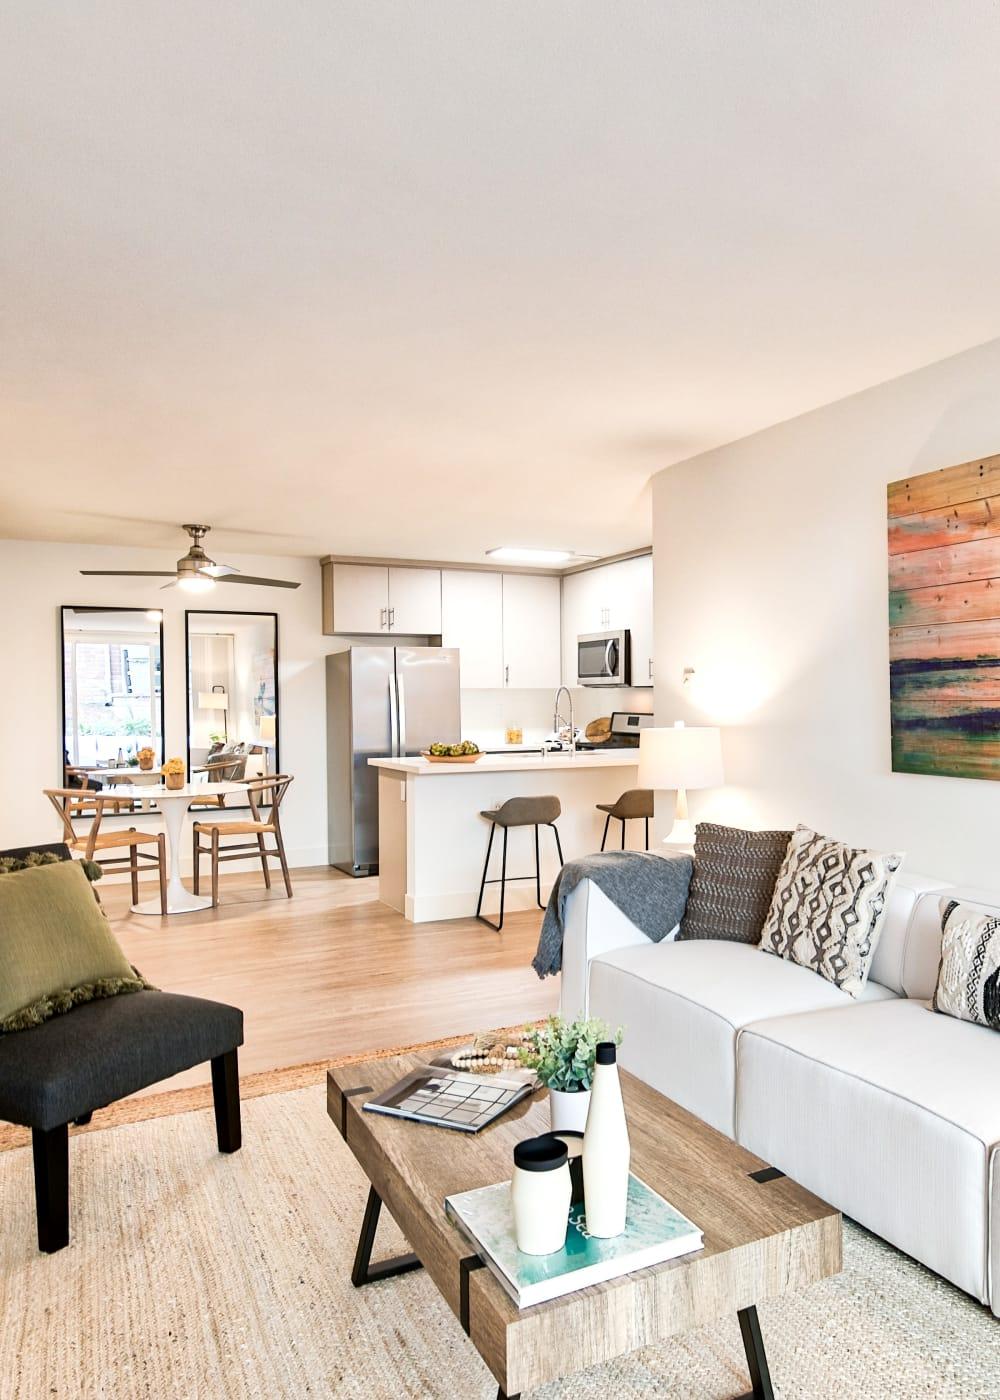 Fox Hills Culver City Ca Apartments For Rent The Meadows